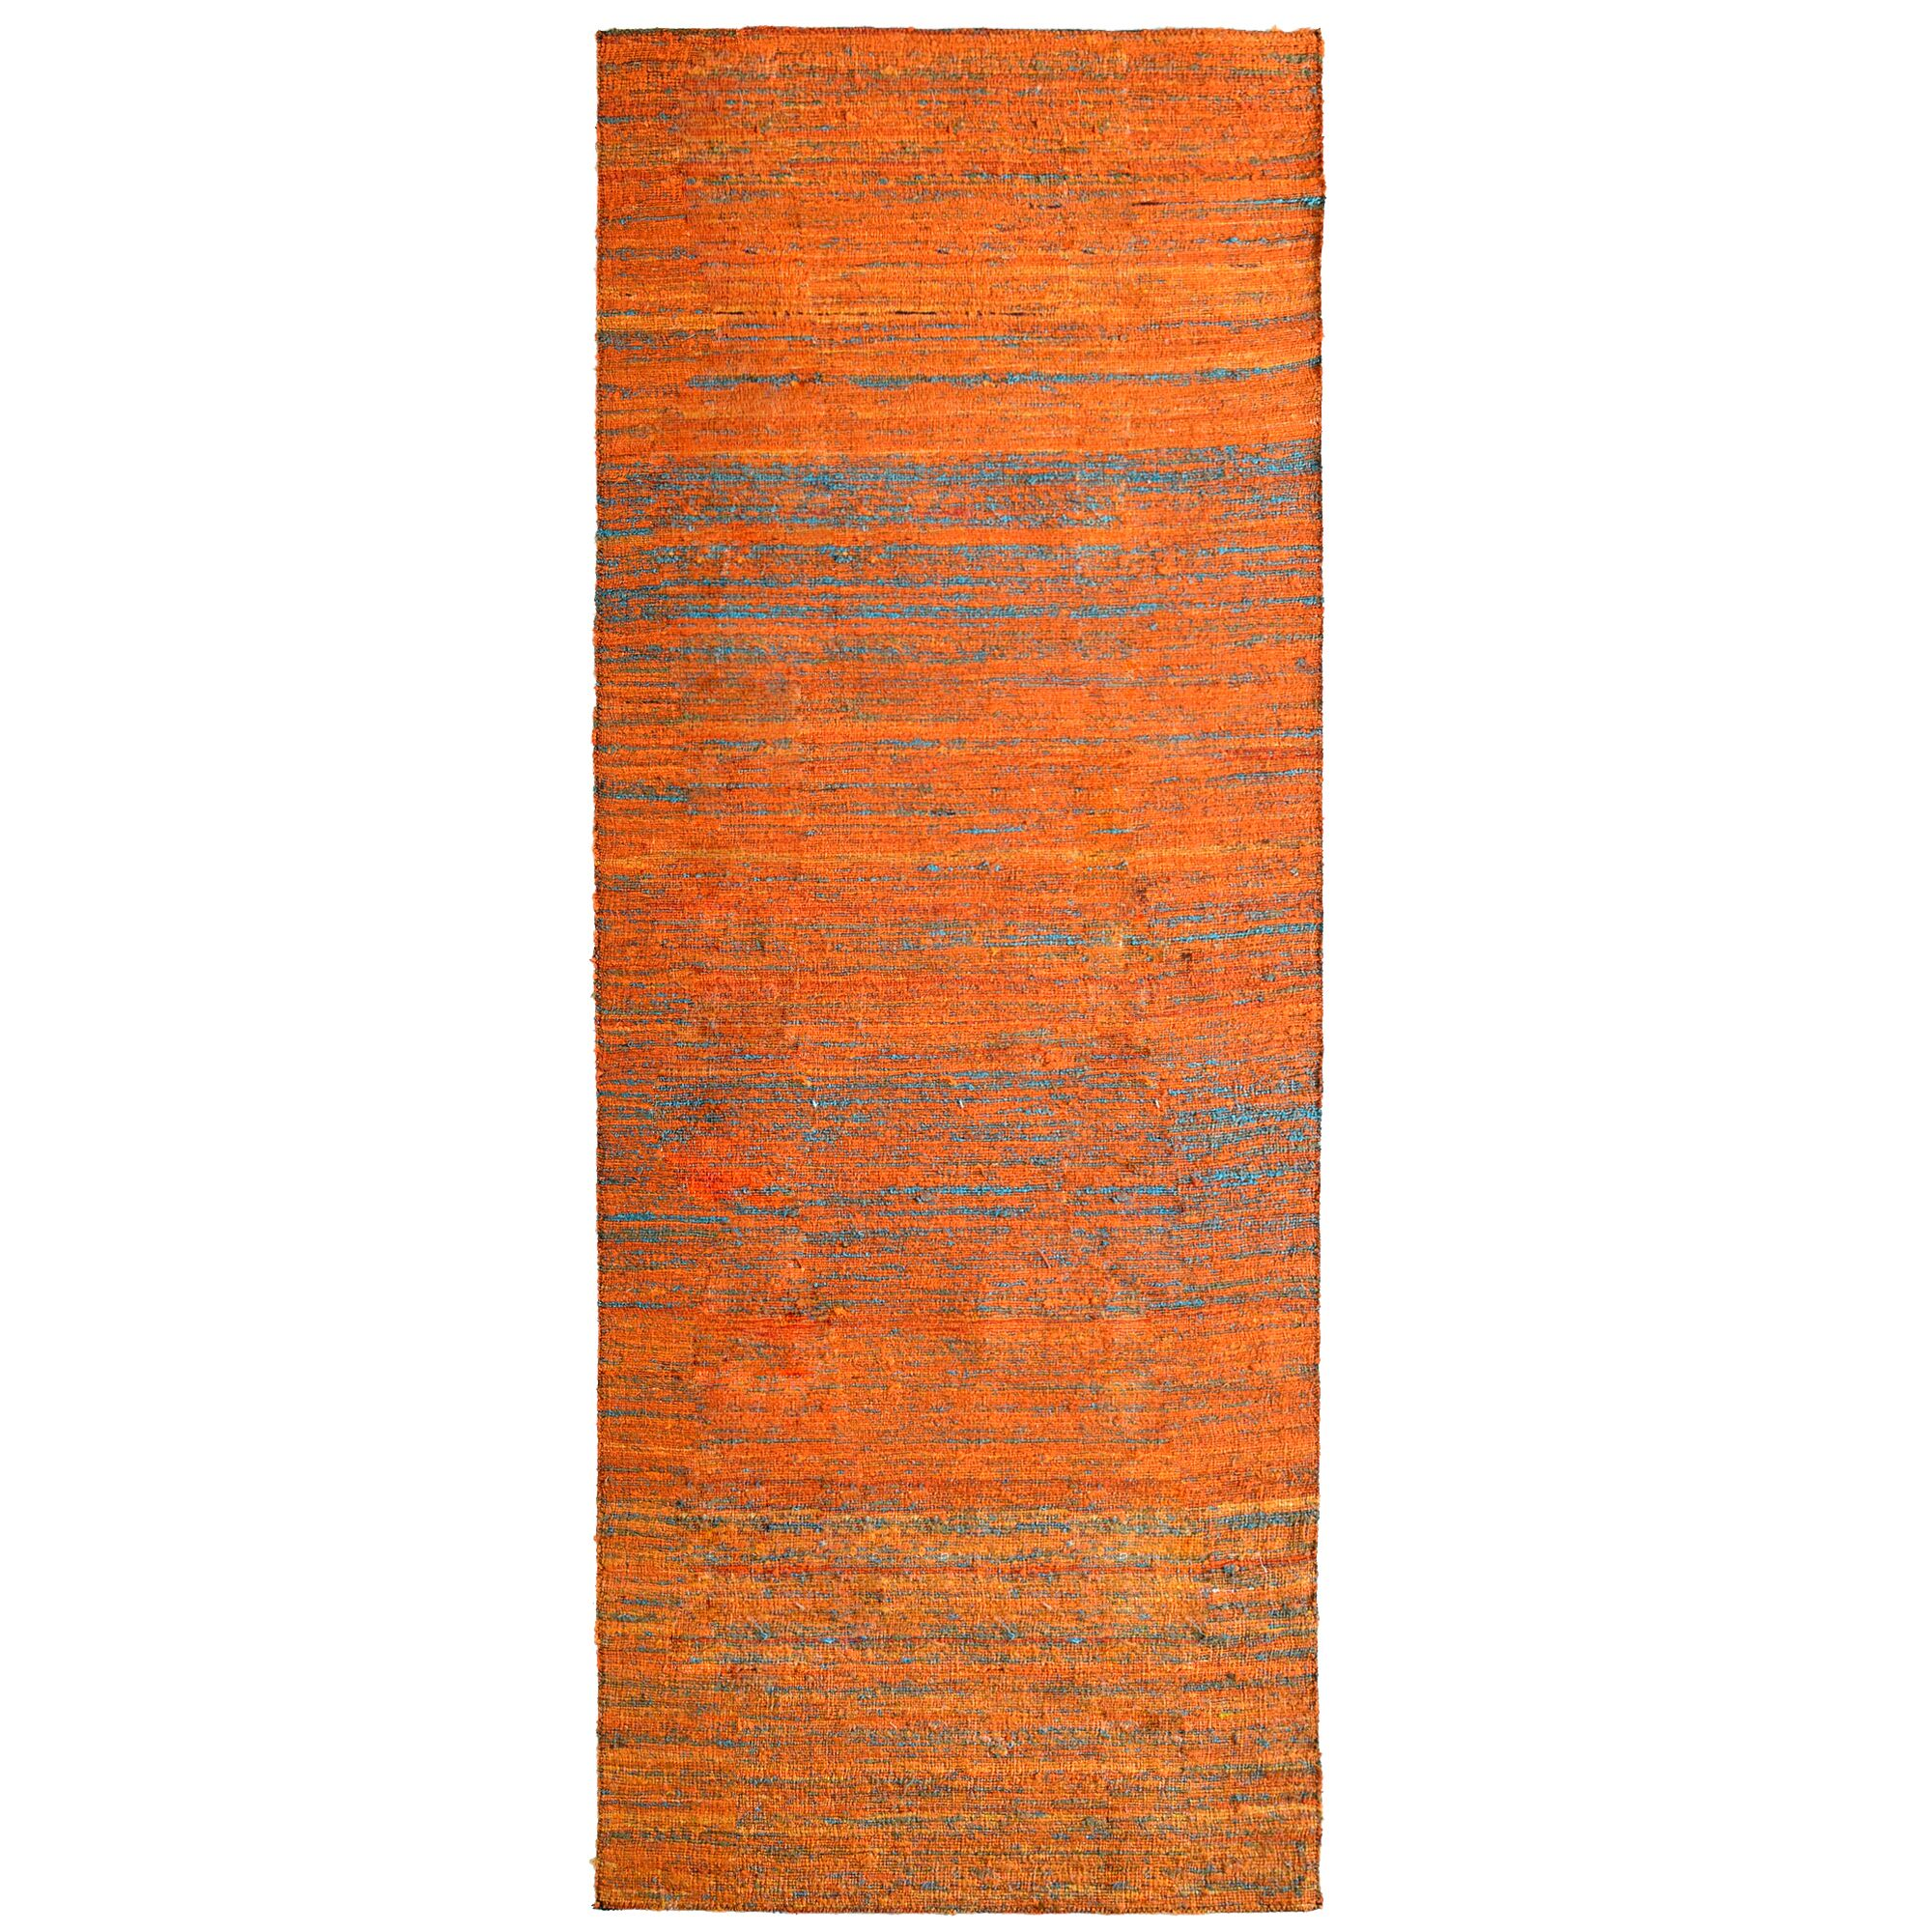 Sari Marigold Hand Woven Area Rug Rug Size: Runner 2' x 8'